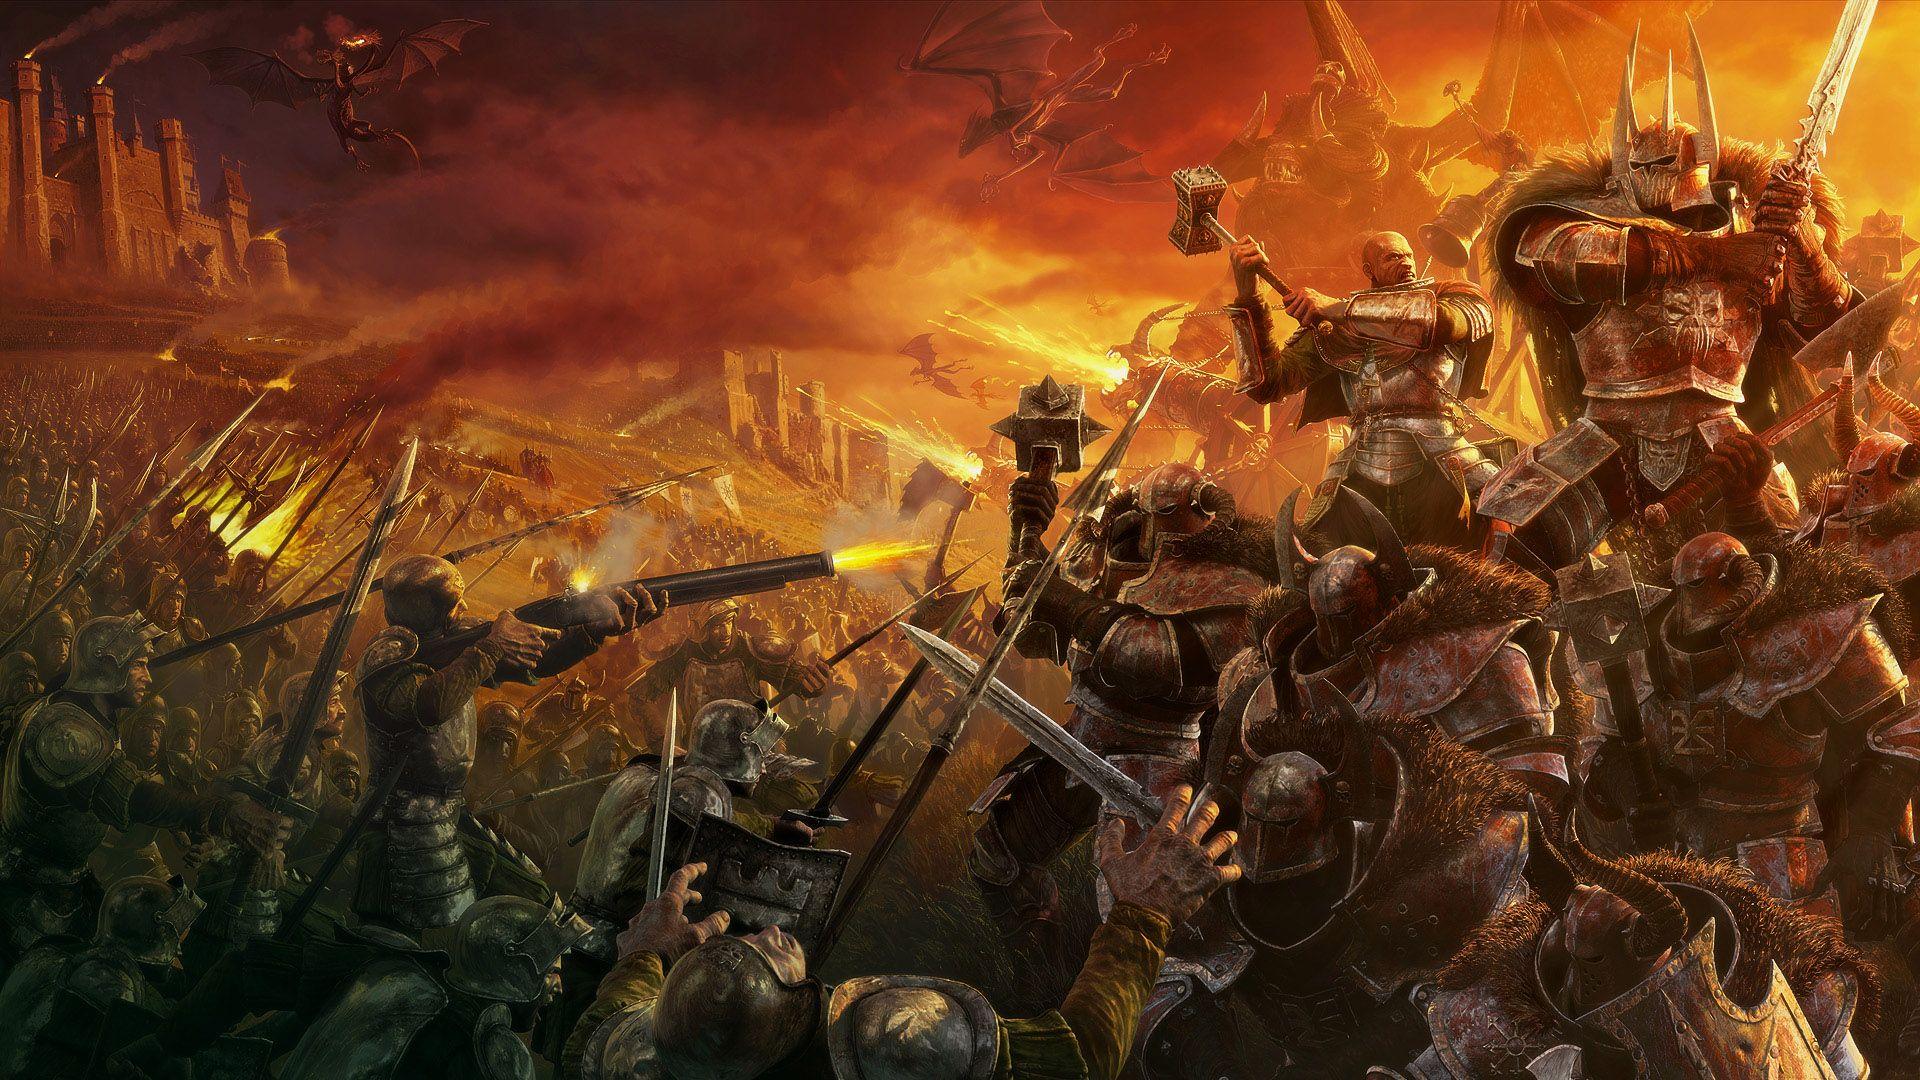 Epic Fight Wallpaper Hd Fantasy Pictures Warriors Wallpaper Fantasy Art